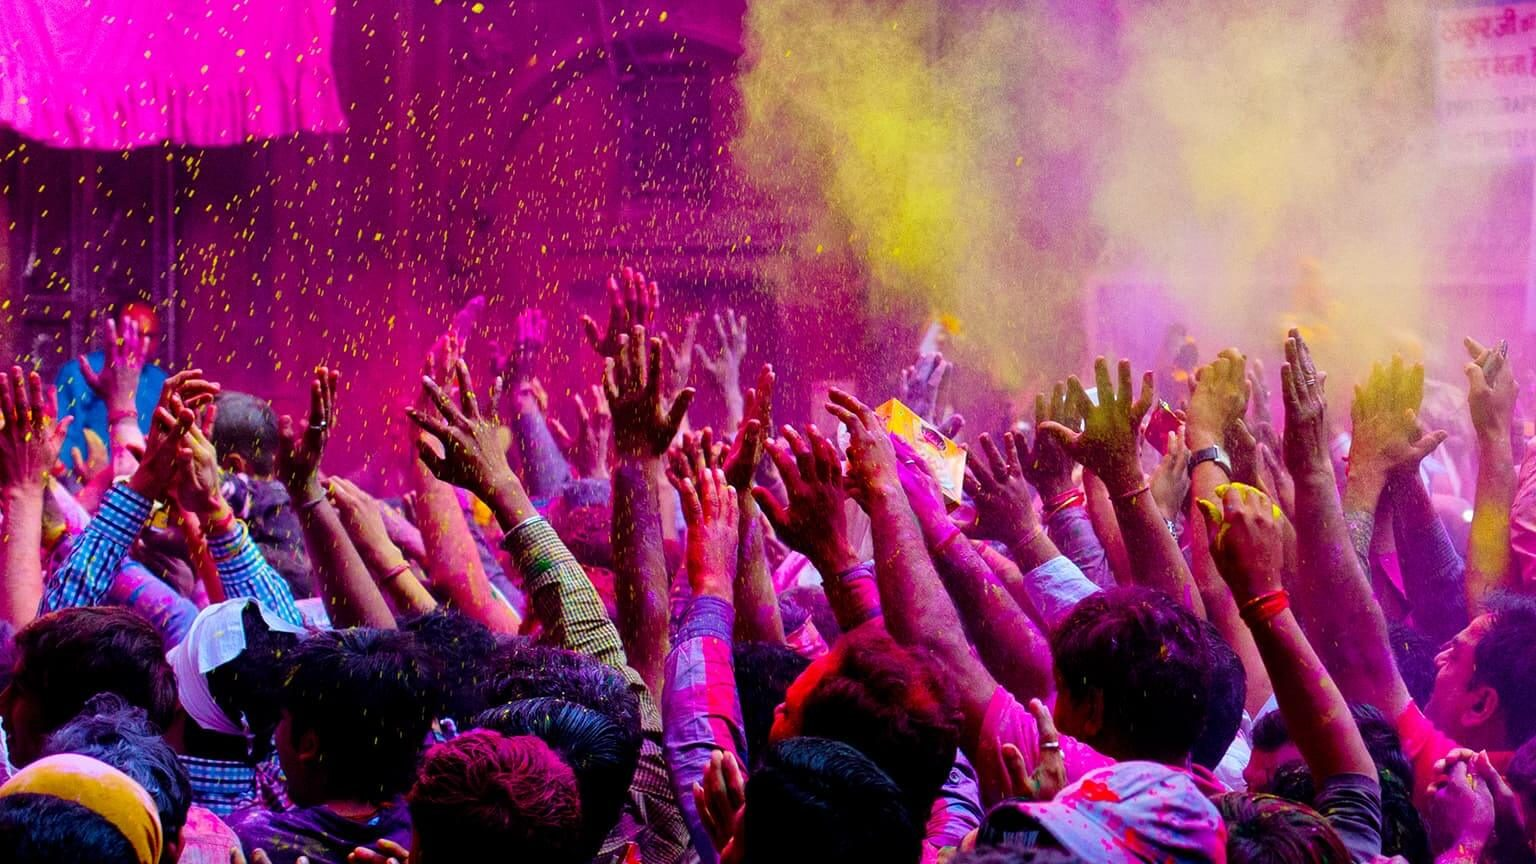 People enjoying Holi festival outdoors in India